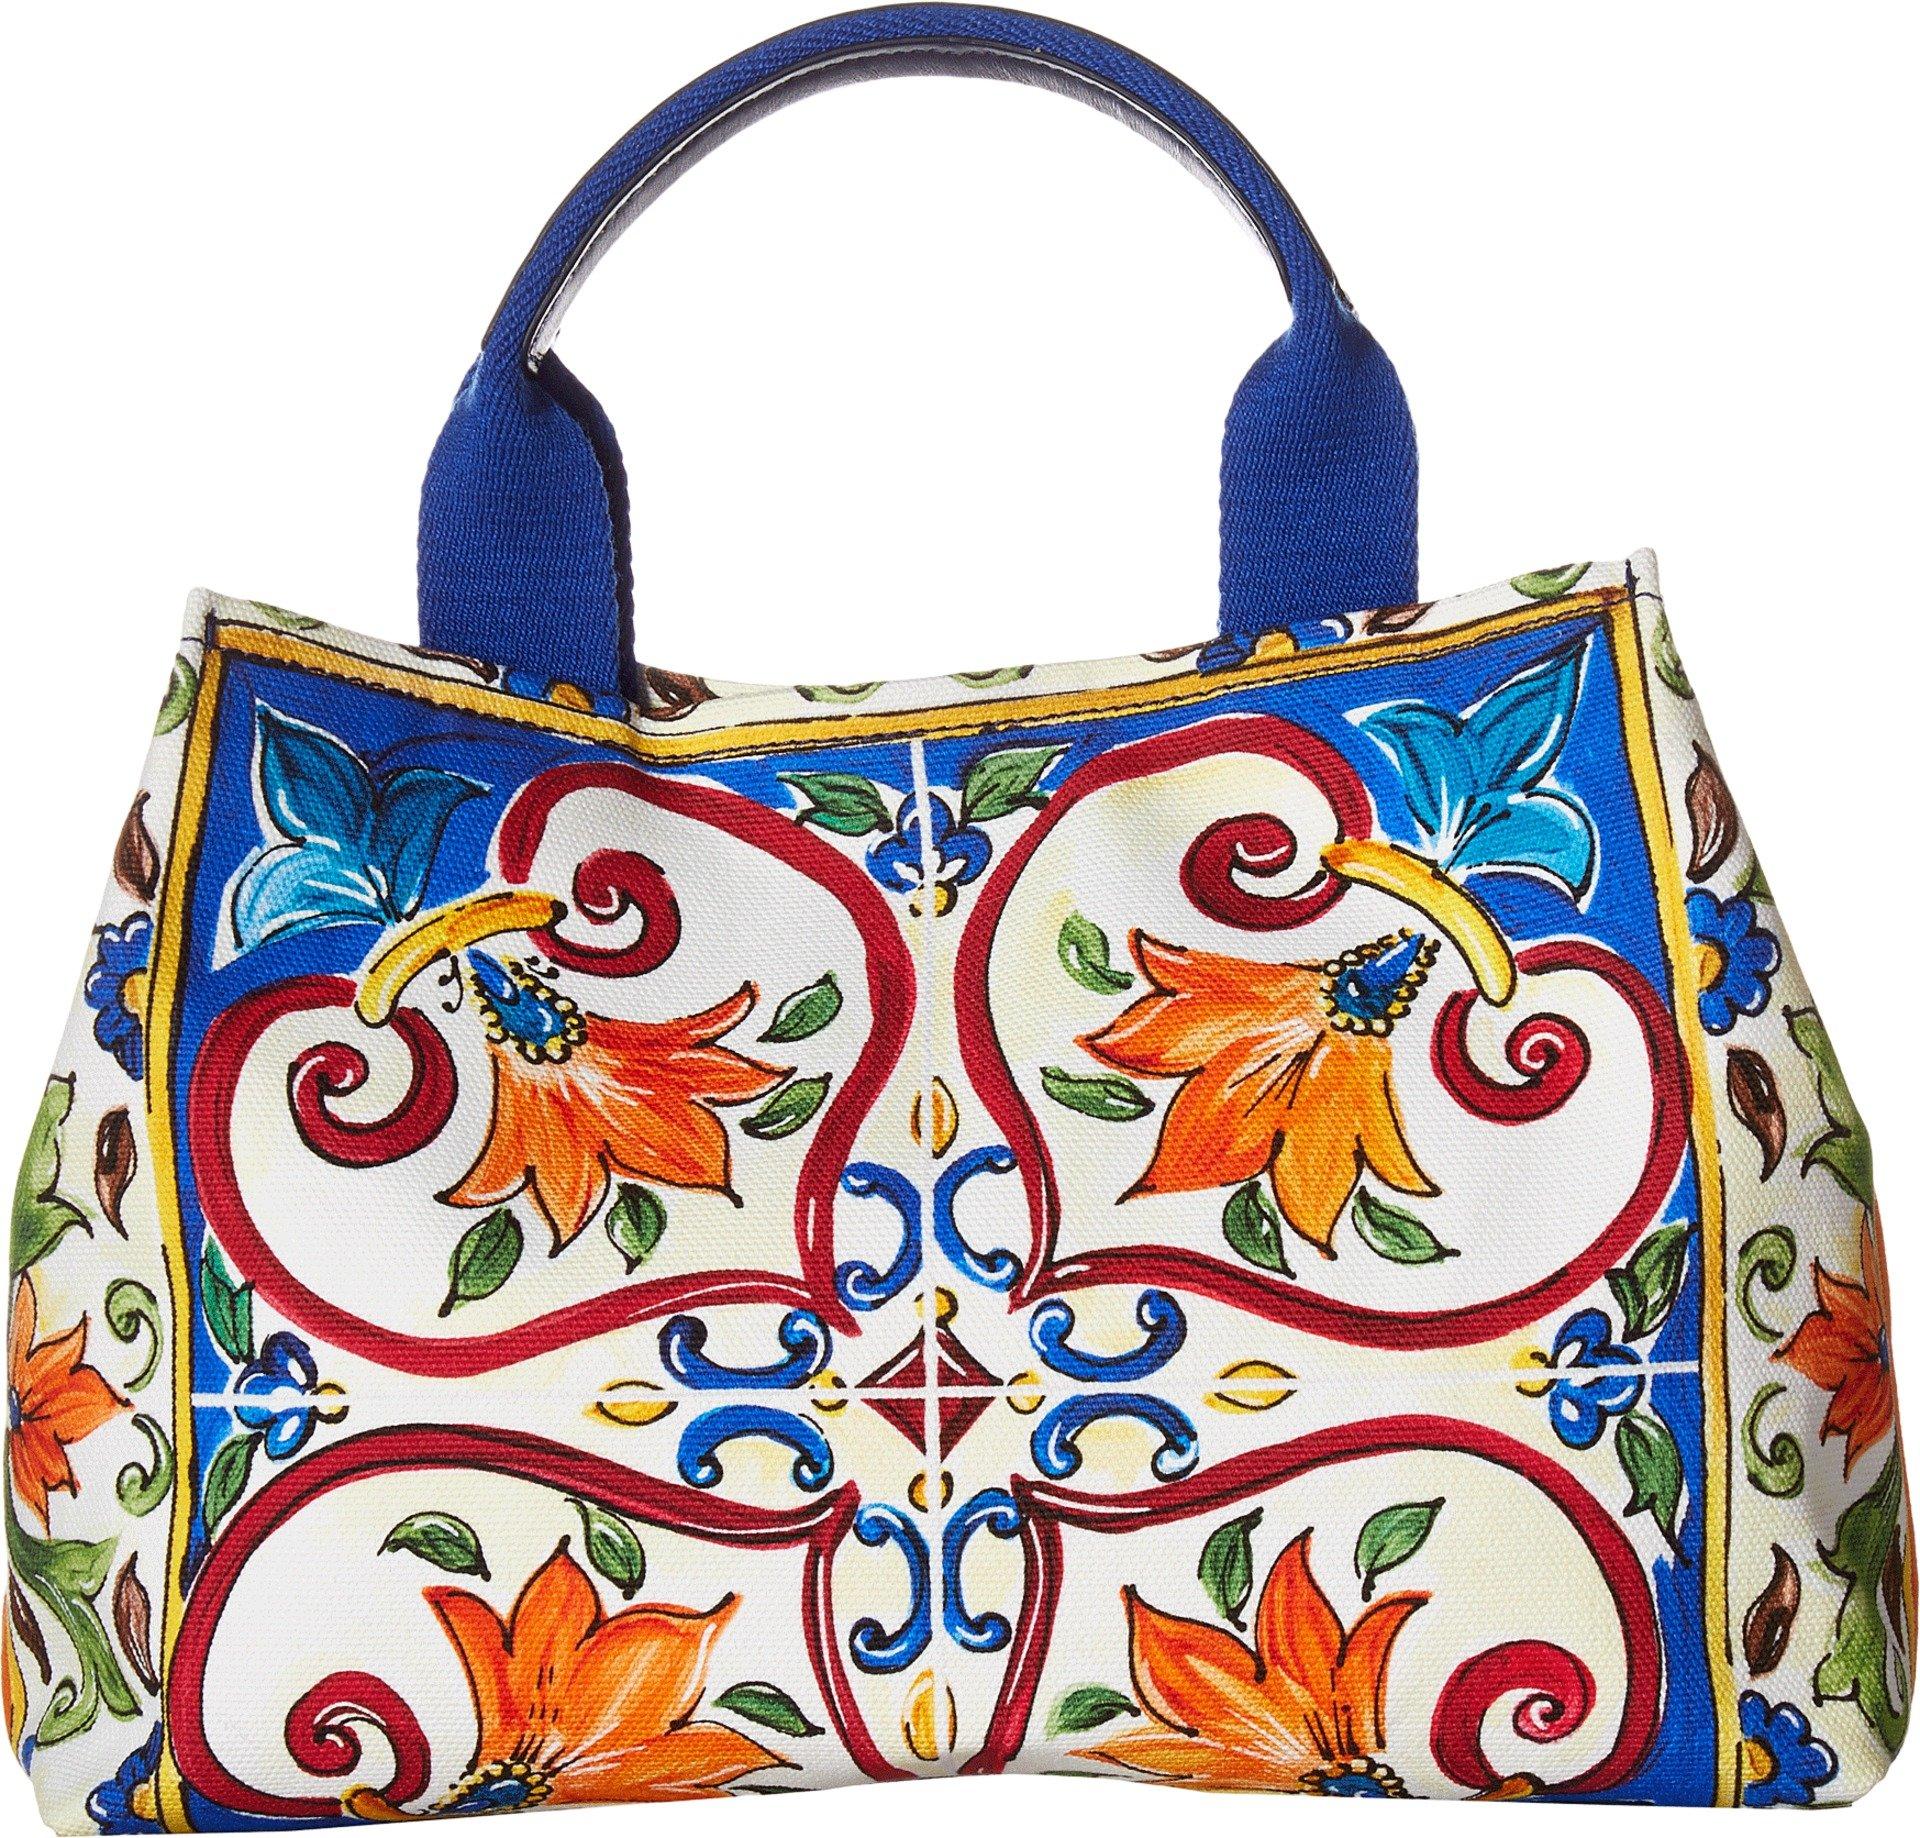 Dolce & Gabbana Kids Women's Top-Handle Bag White Print One Size